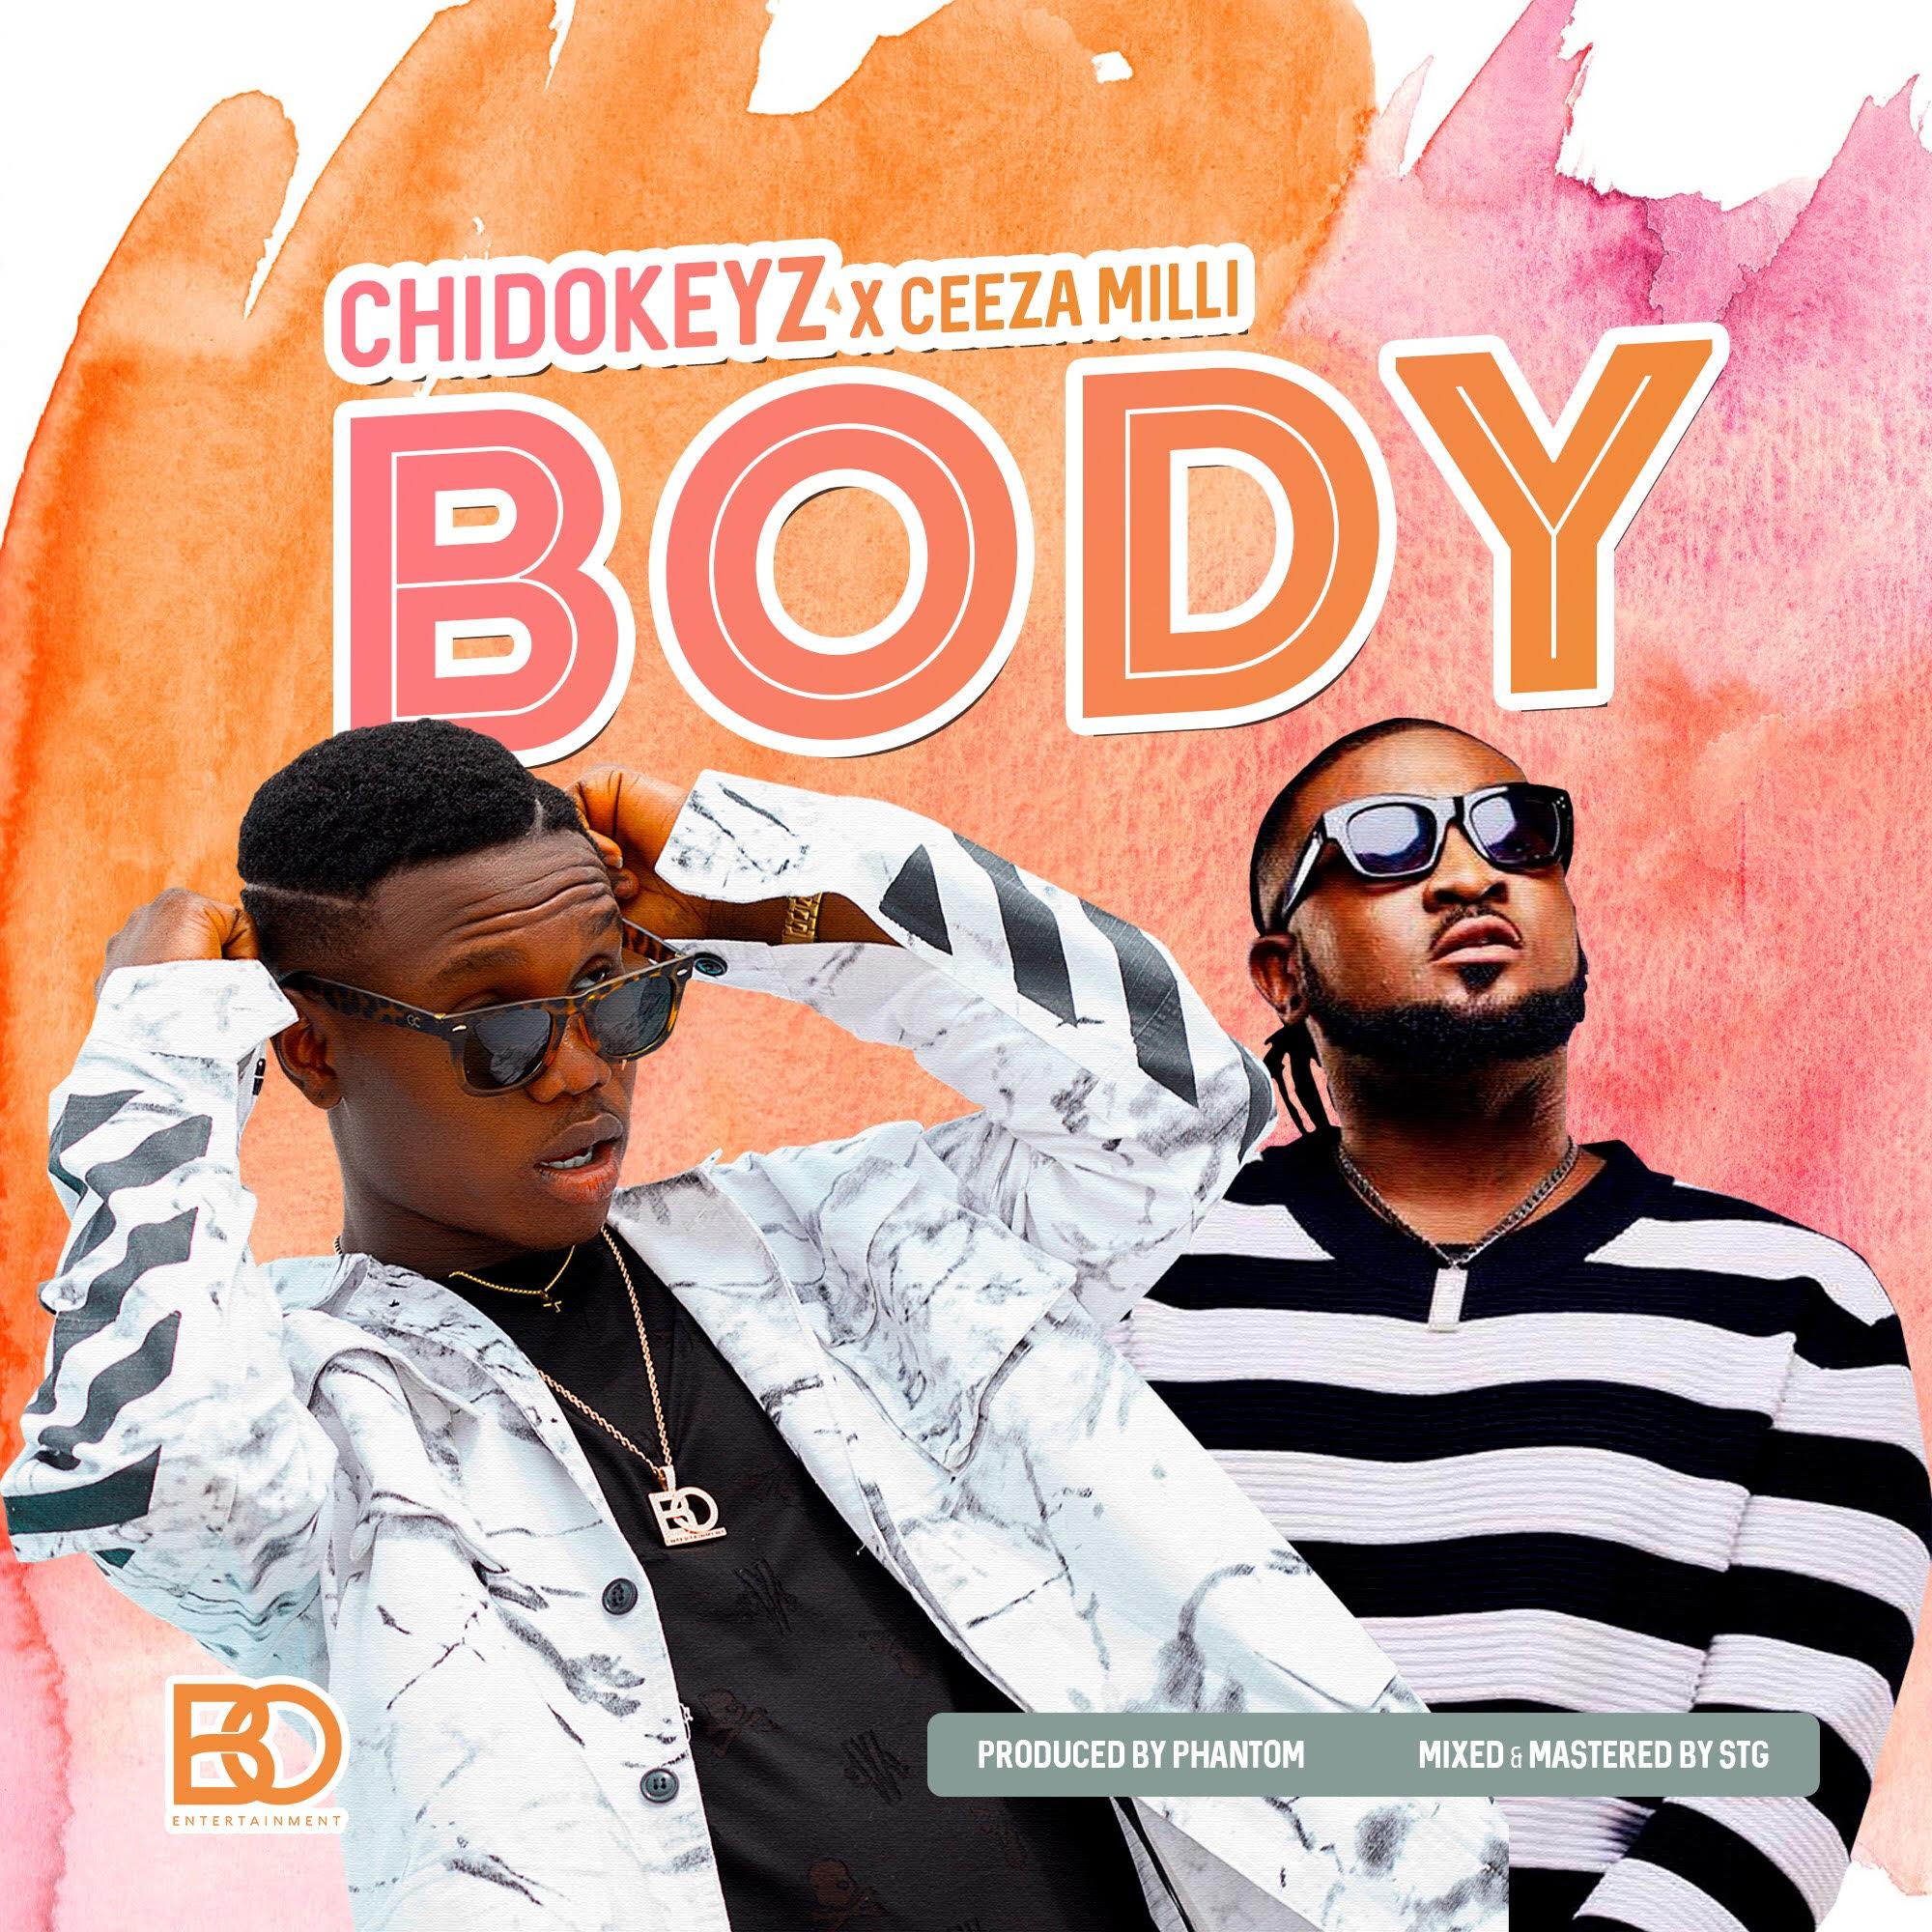 Chidokeyz – Body ft. Ceeza Milli (prod. Phantom)